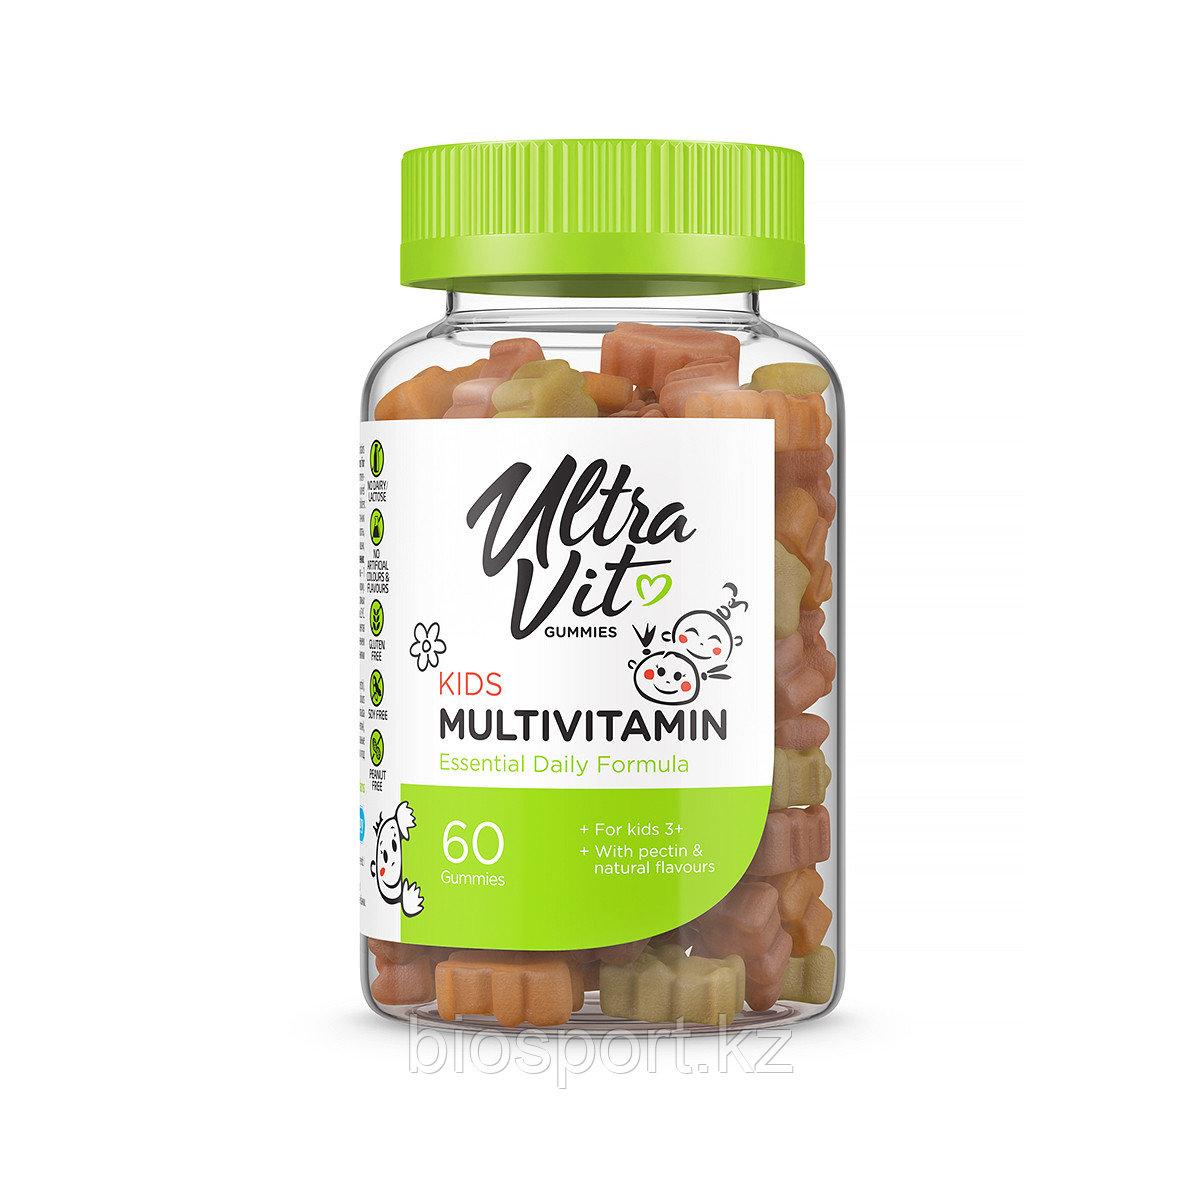 Gummies Kids Multivitamin, 60 конфет, UltraVit.